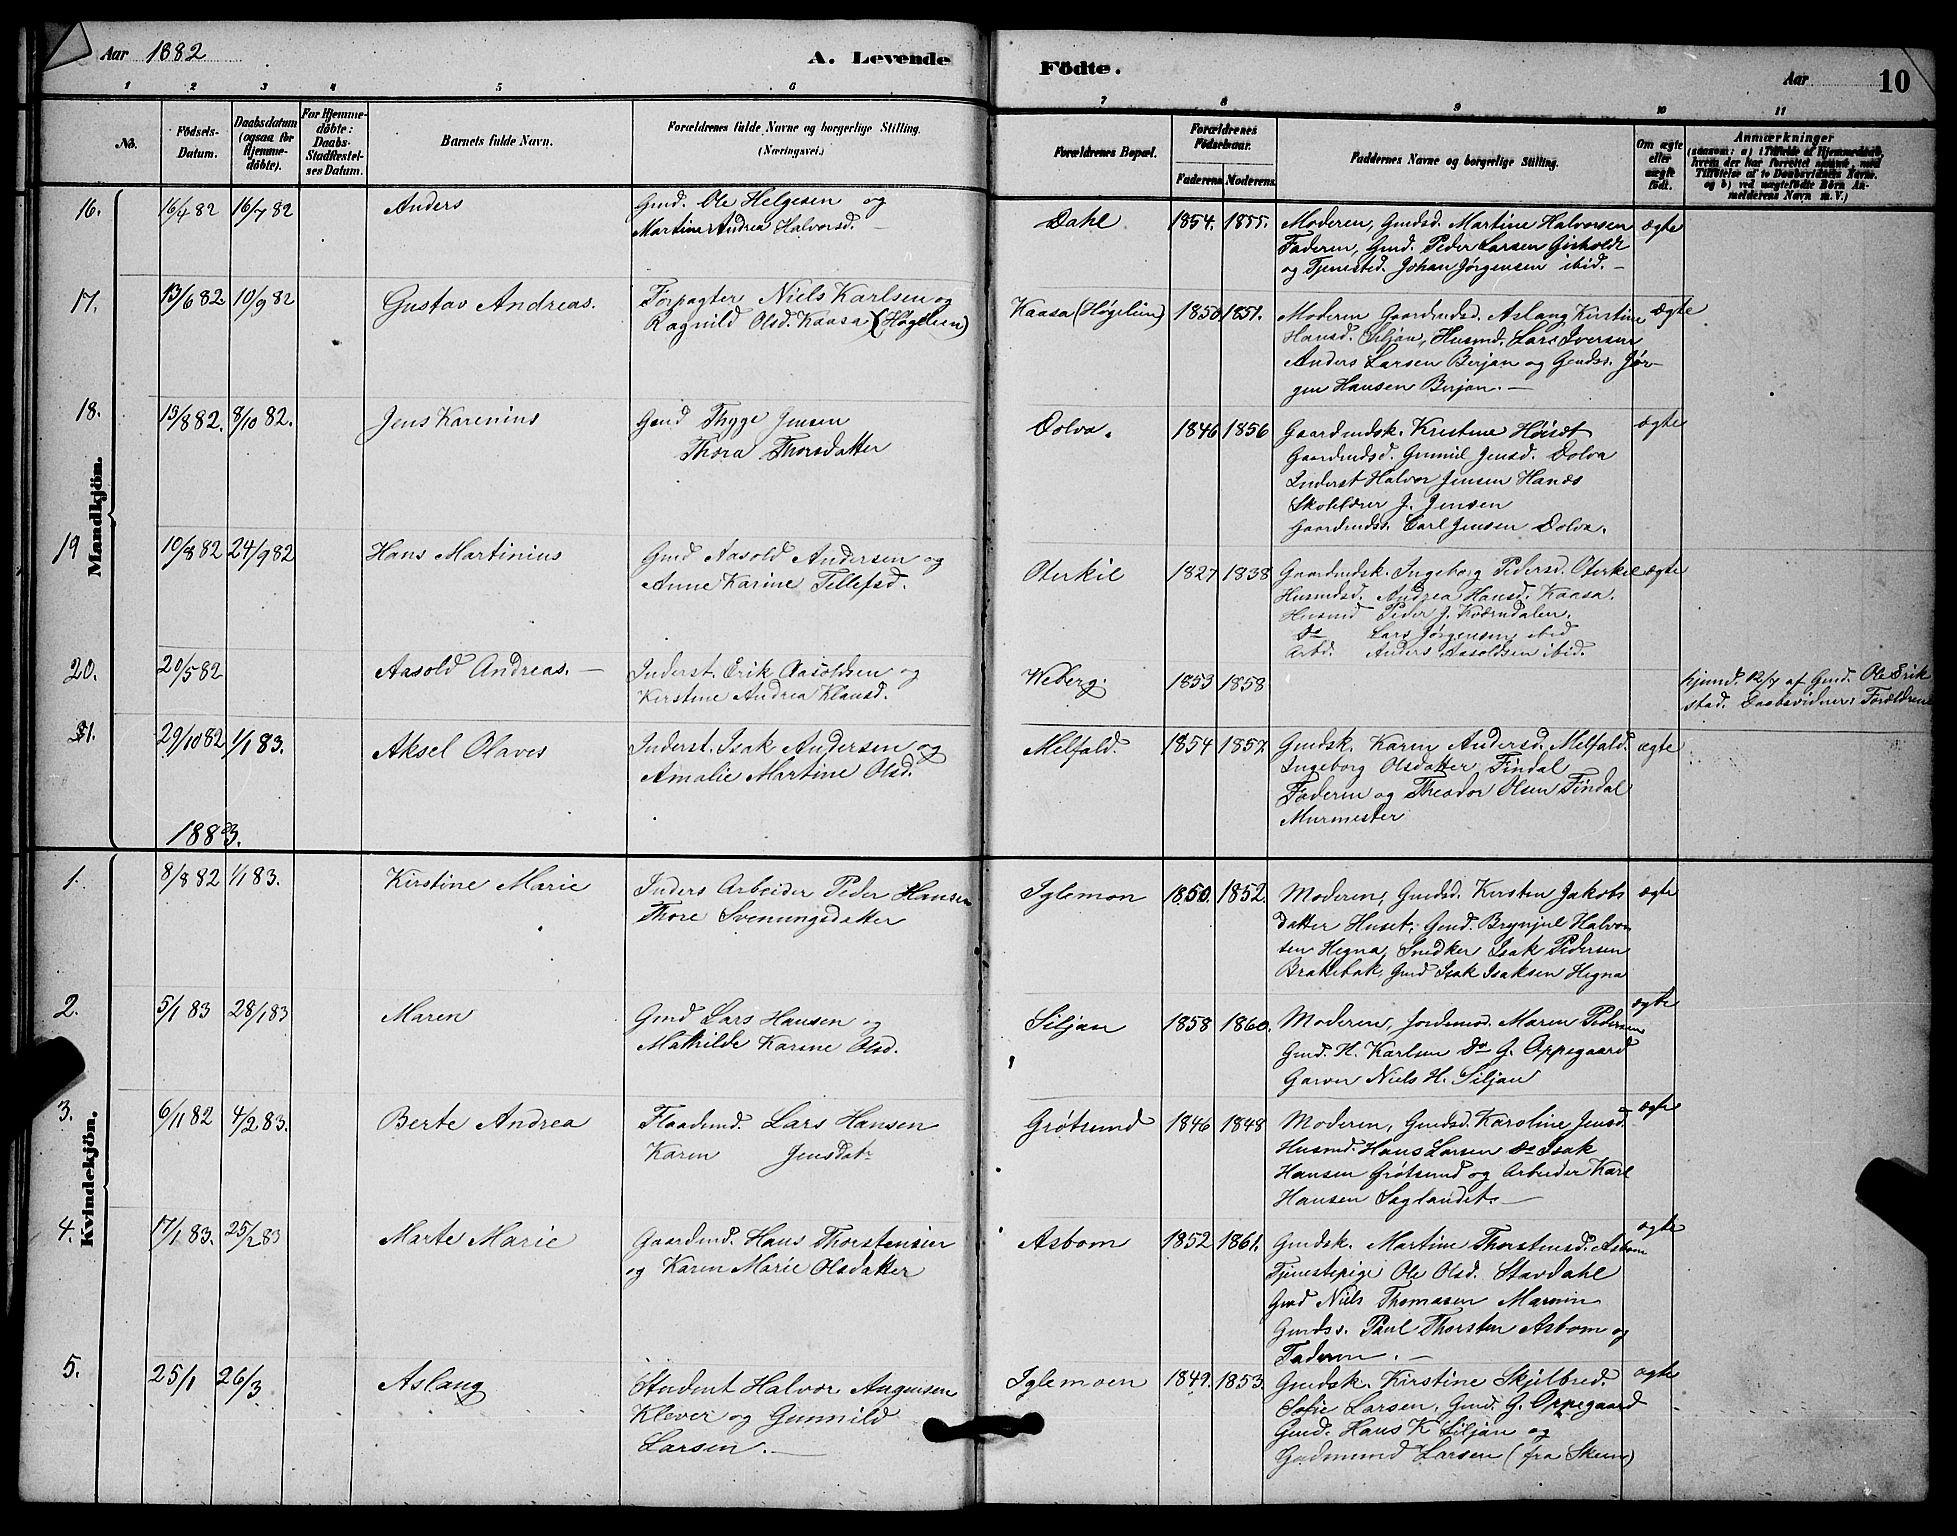 SAKO, Solum kirkebøker, G/Gb/L0003: Klokkerbok nr. II 3, 1880-1898, s. 10